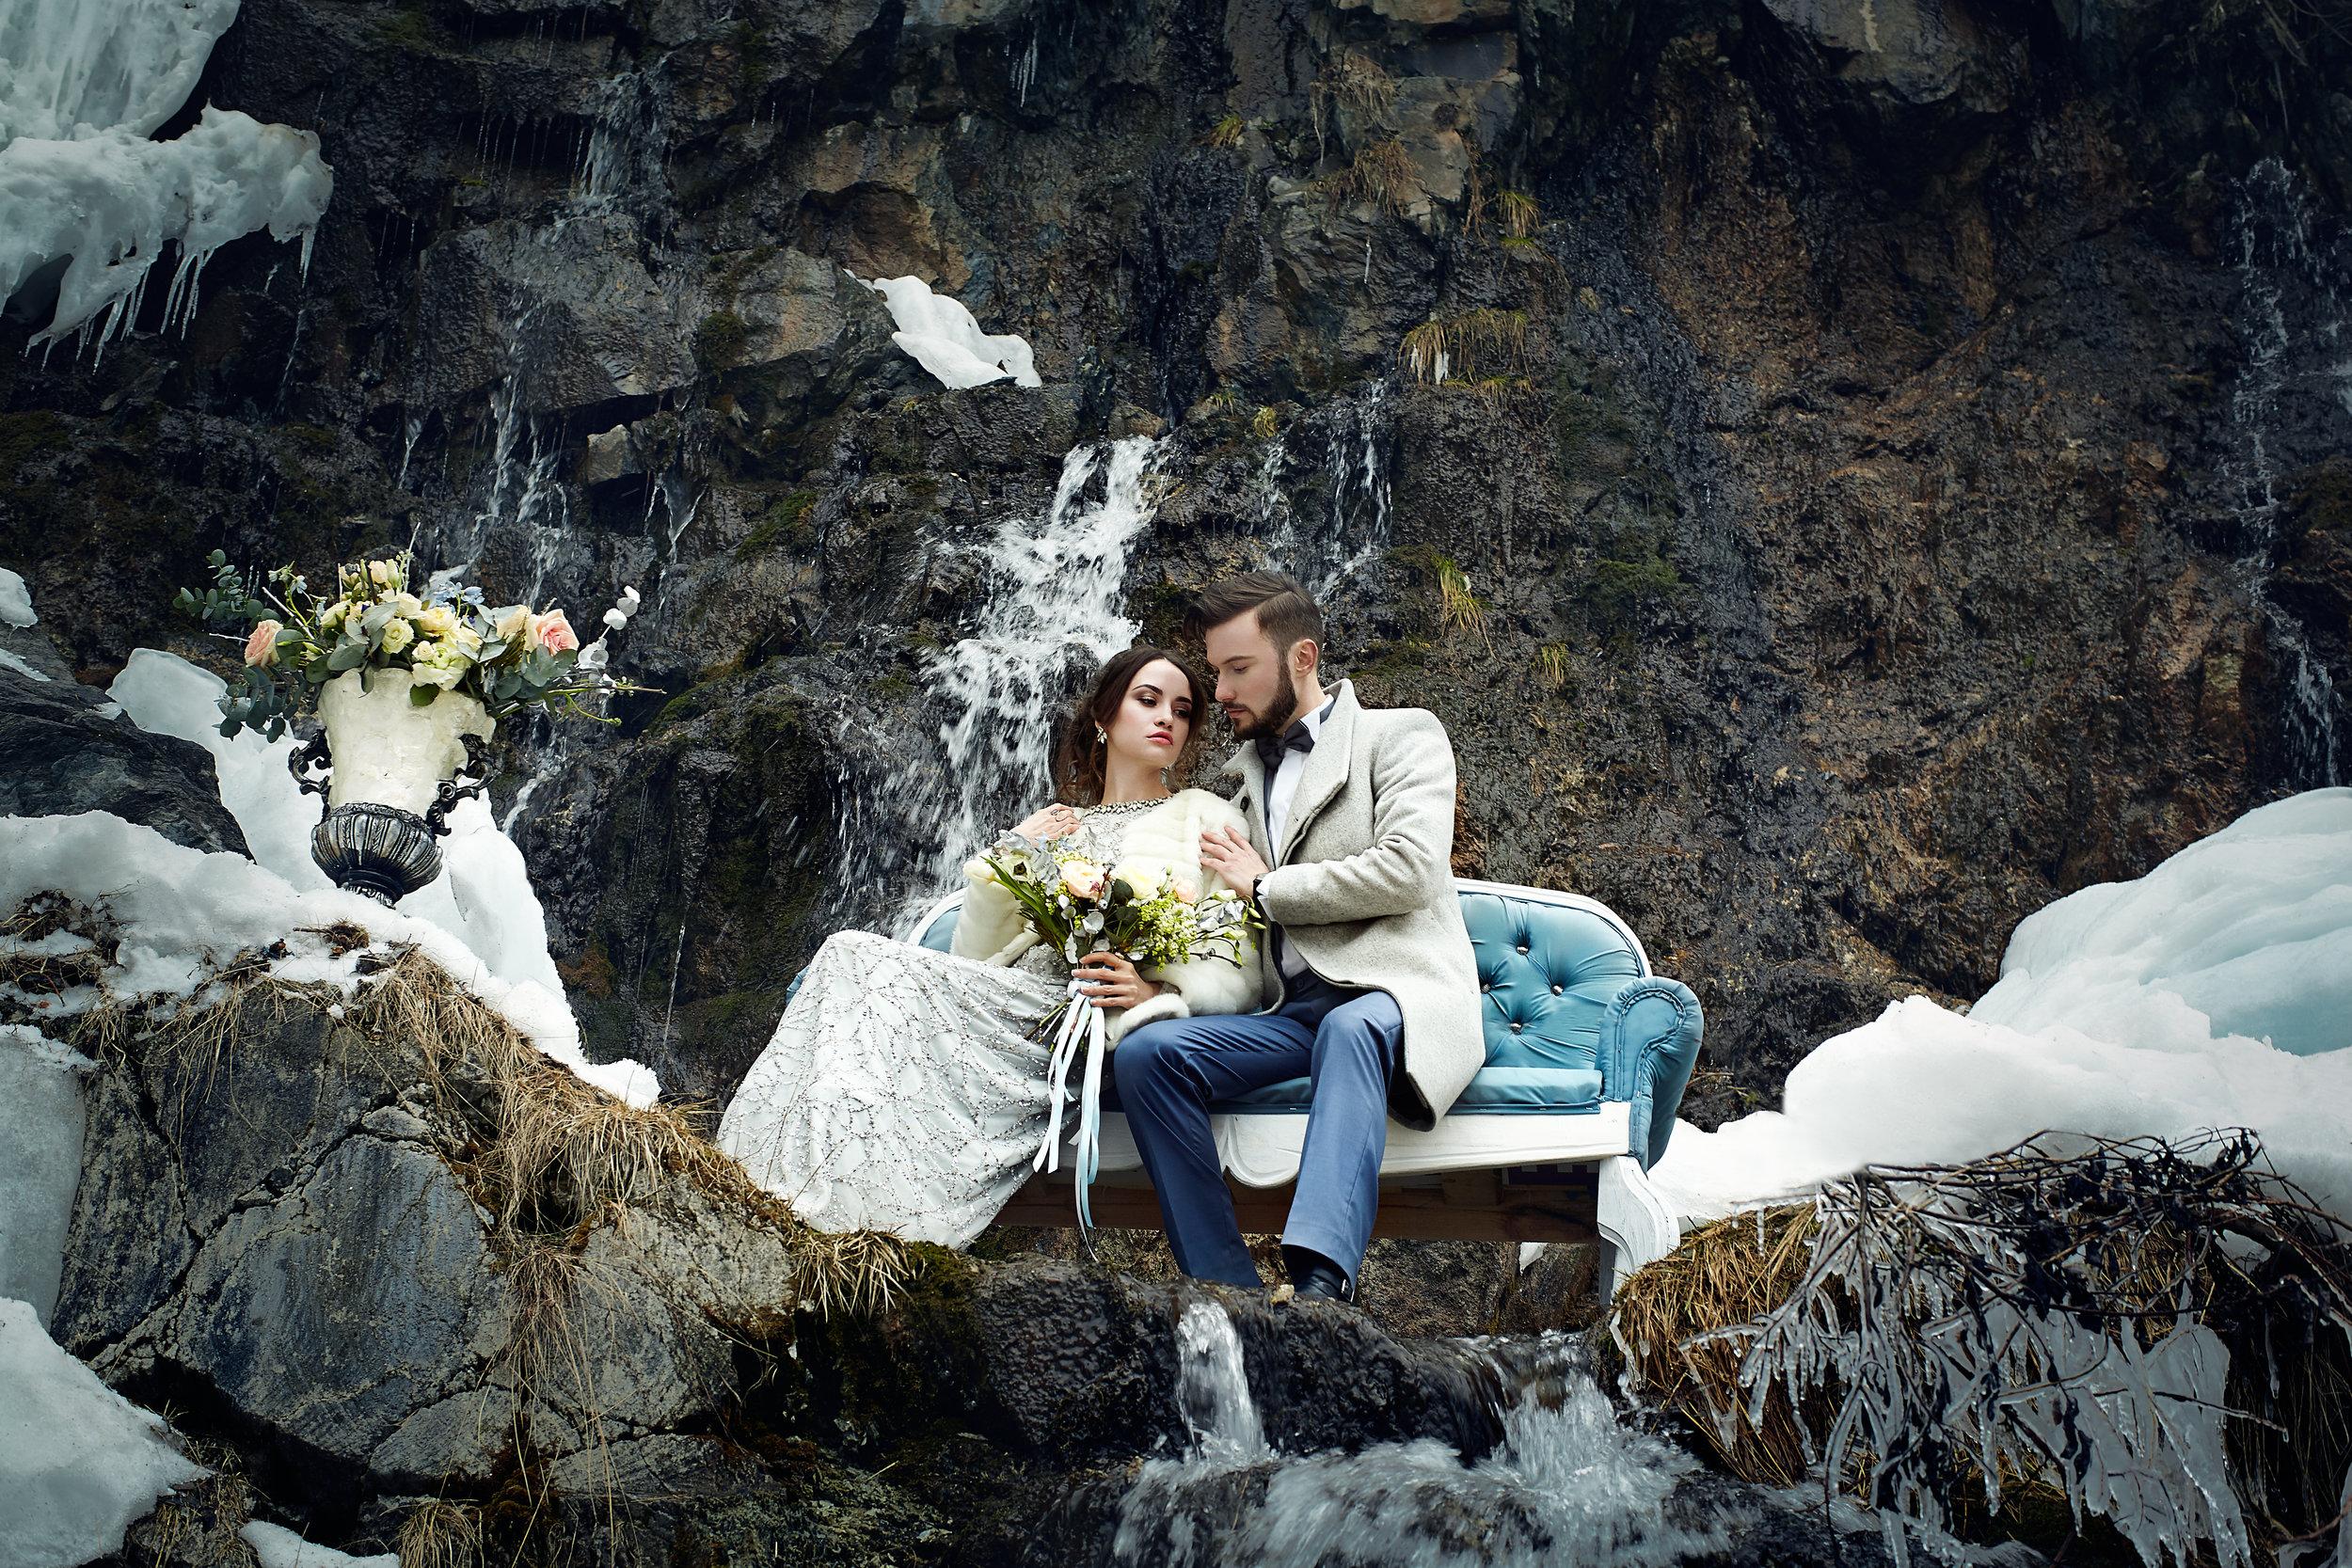 happy-couple-hugging-on-rock-on-the-background-of-PBMUMJ5.jpg